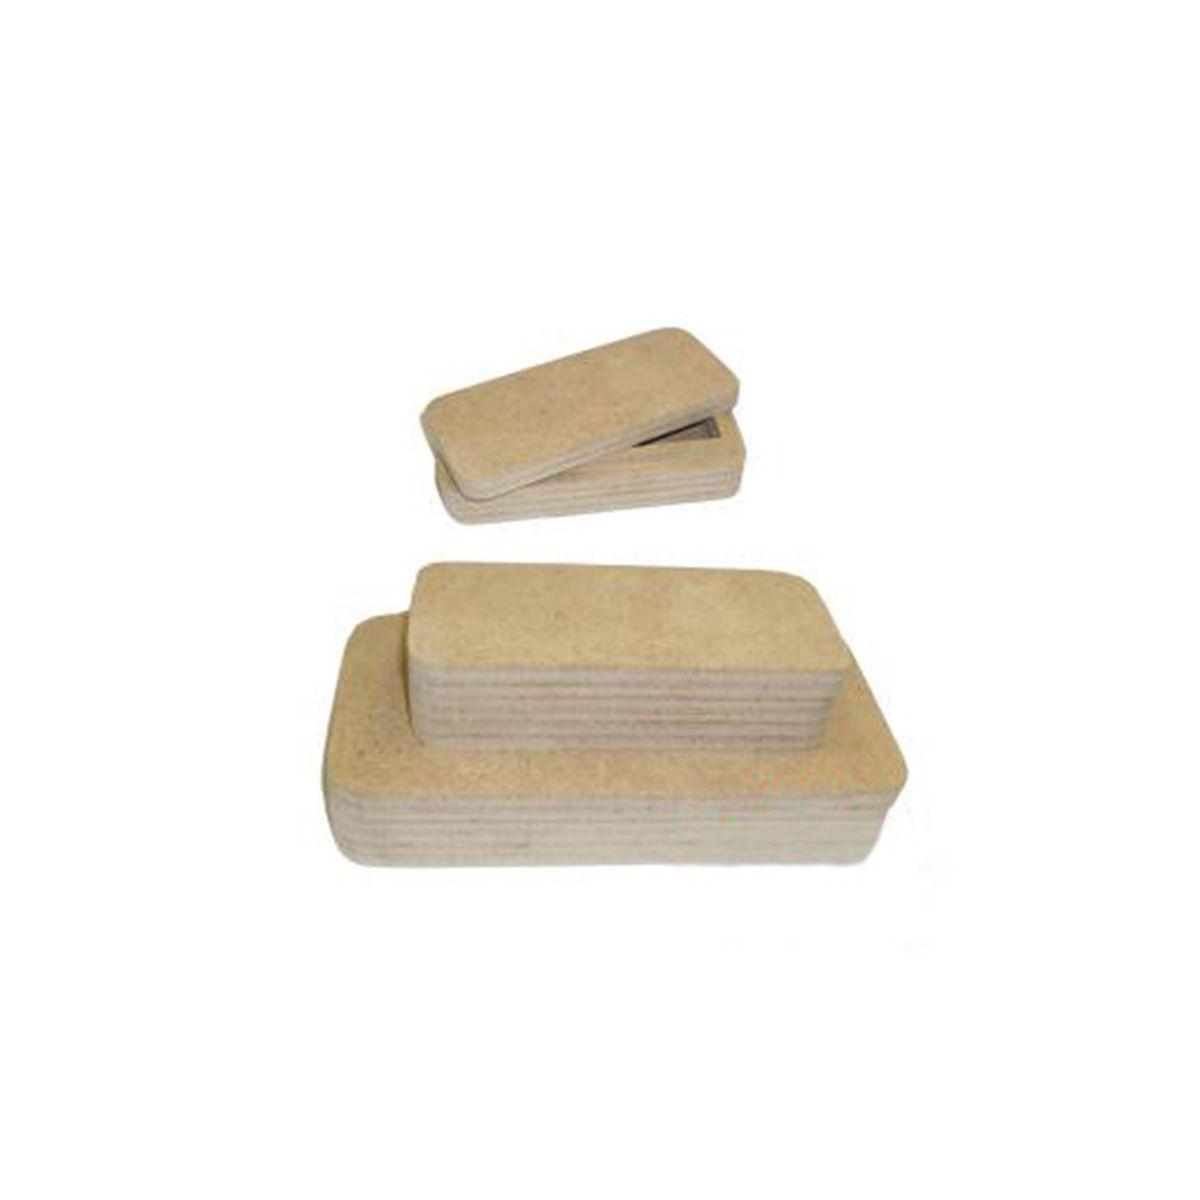 AH6140136 Заготовка из МДФ ' Купюрница и монетница', набор из 2-х штук, 19х10х3,5 см. 14х6х3,5 см